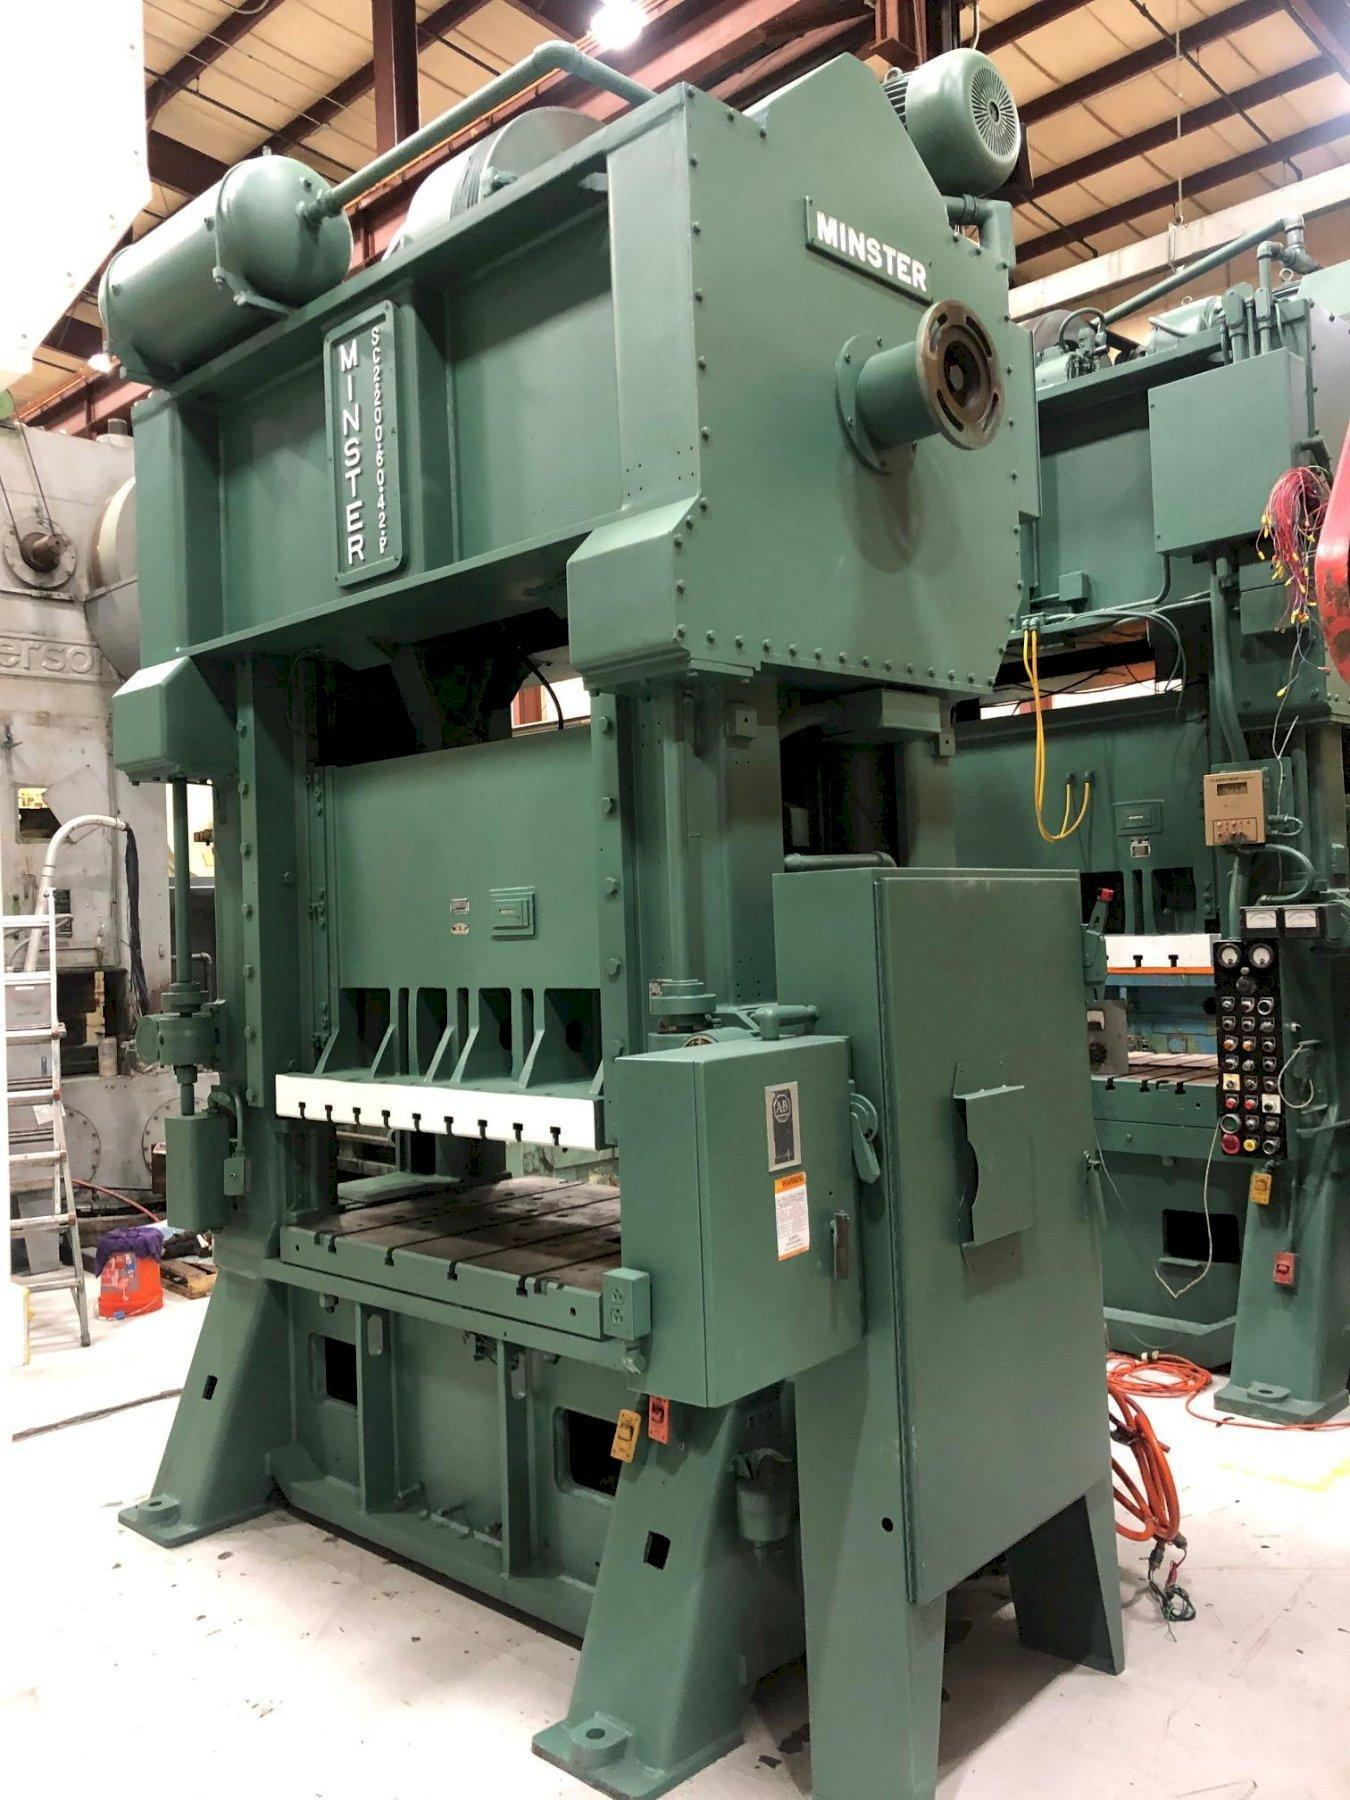 200 Ton MINSTER SC2-200-60-42 Hevi-stamper Straight Side Press